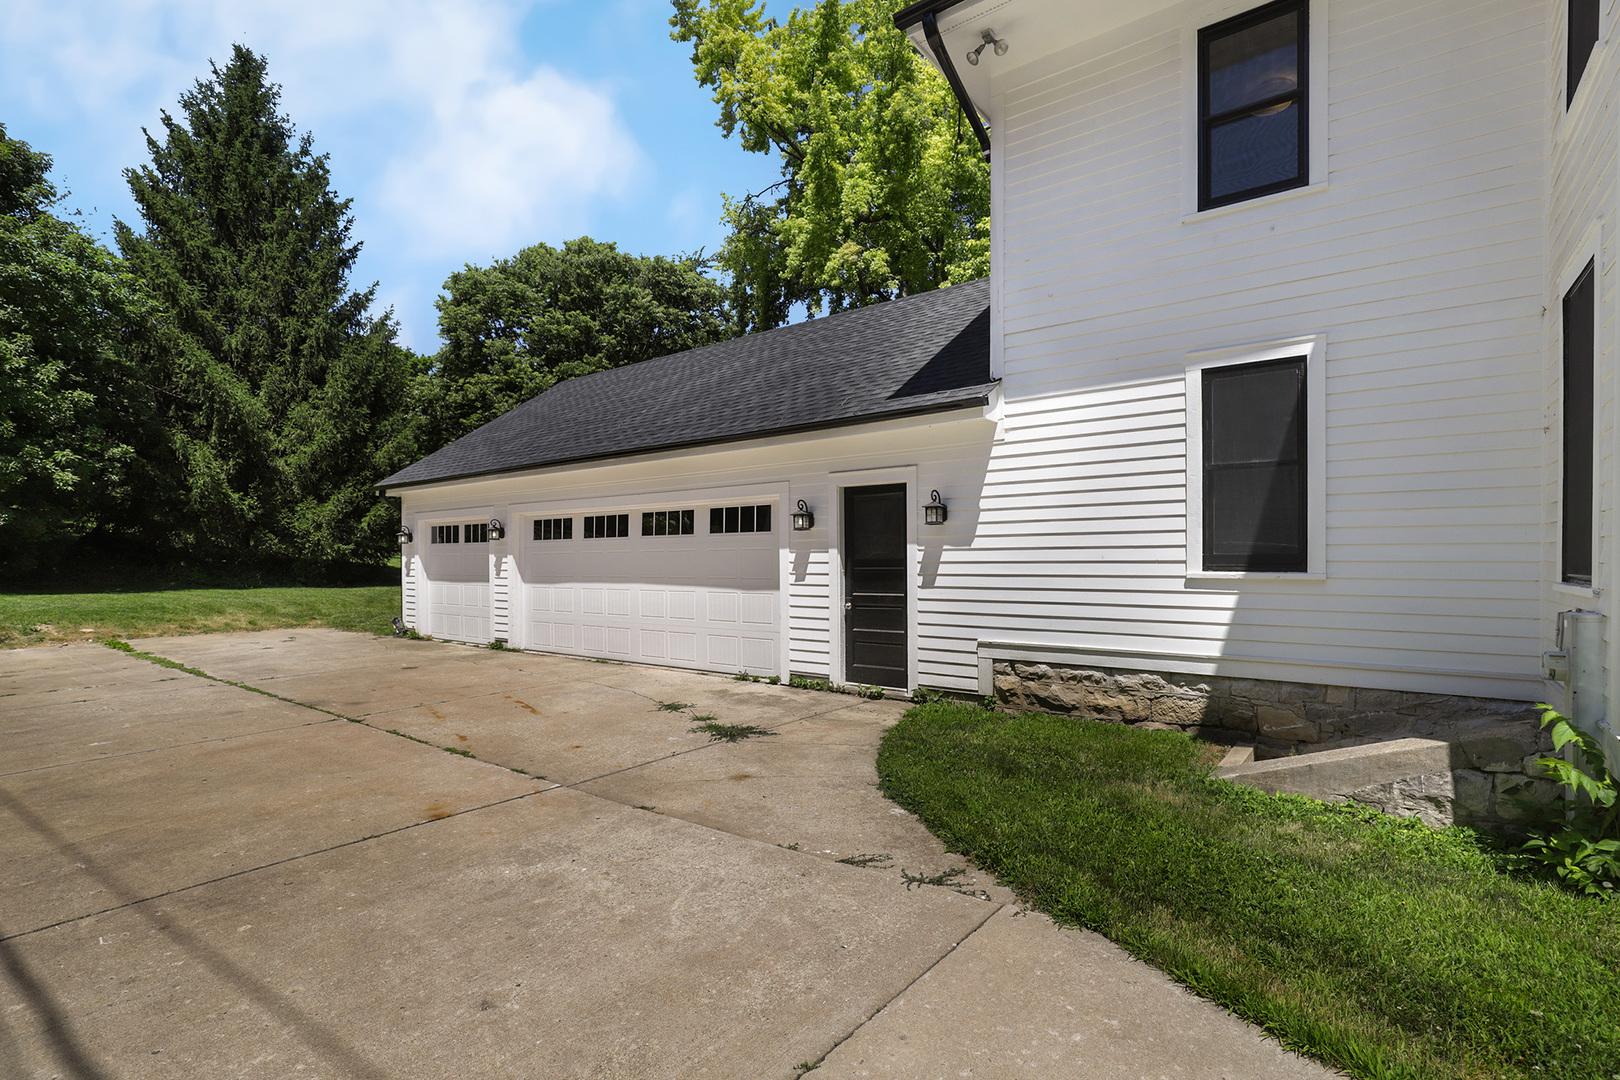 616 North York, Hinsdale, Illinois, 60521